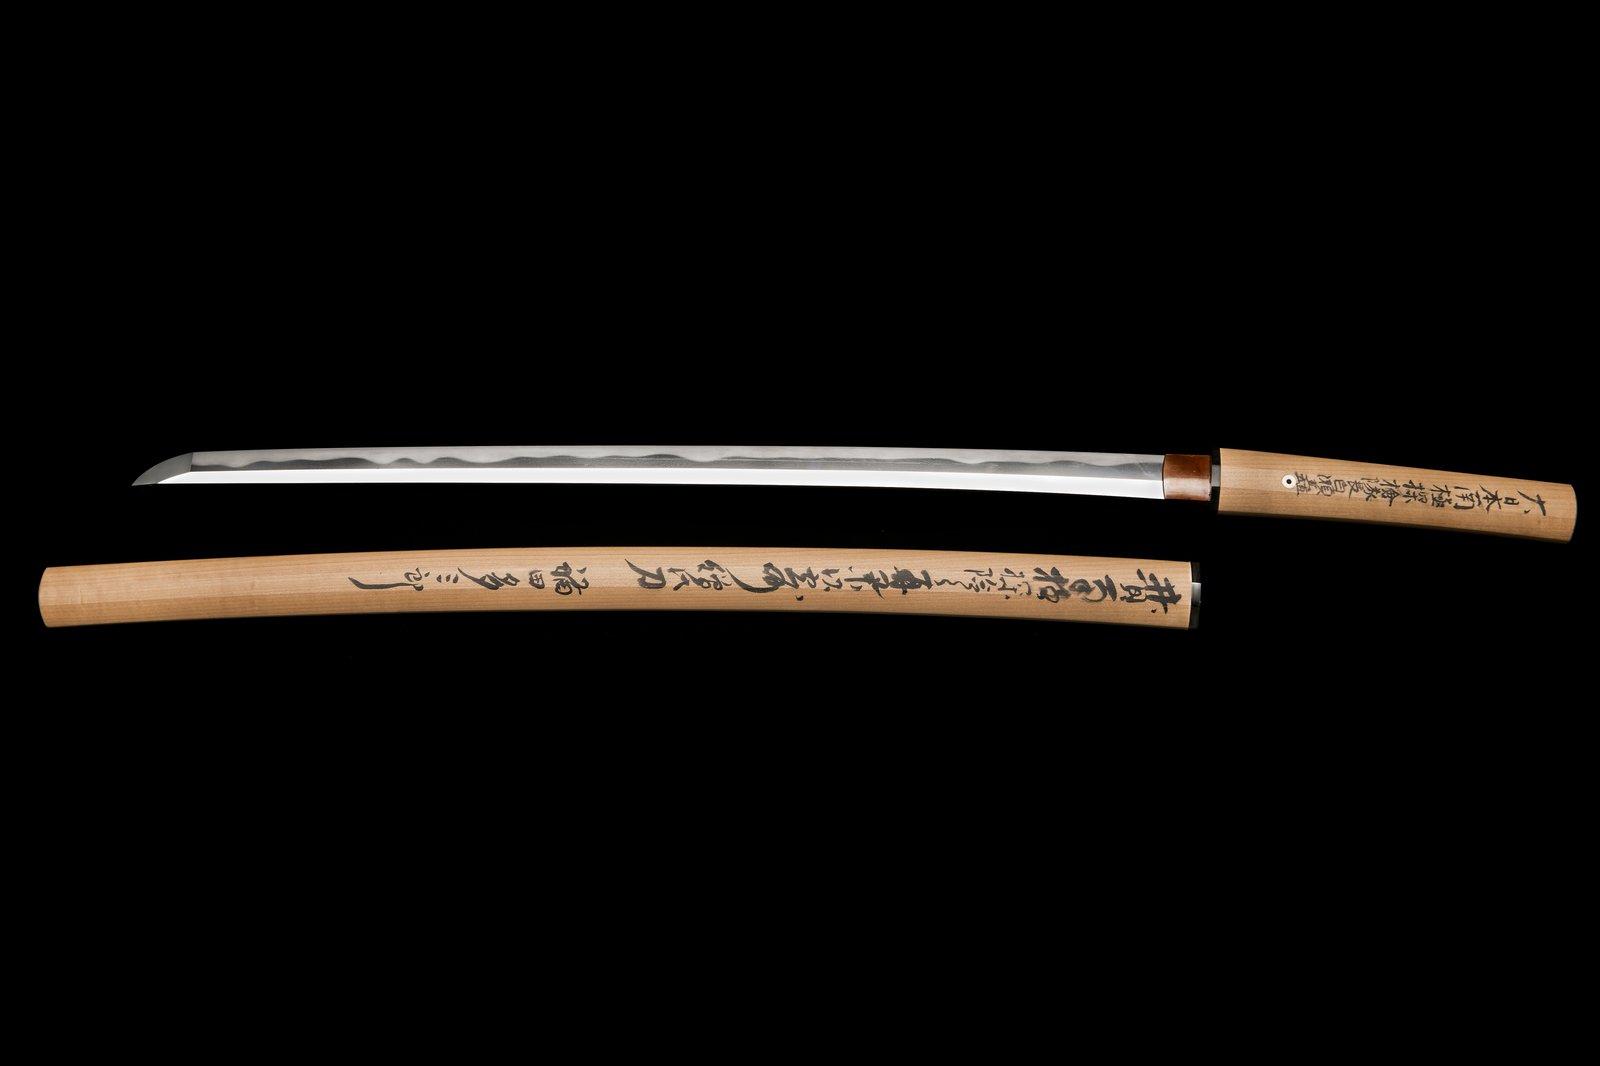 Shirase Sword or Katana